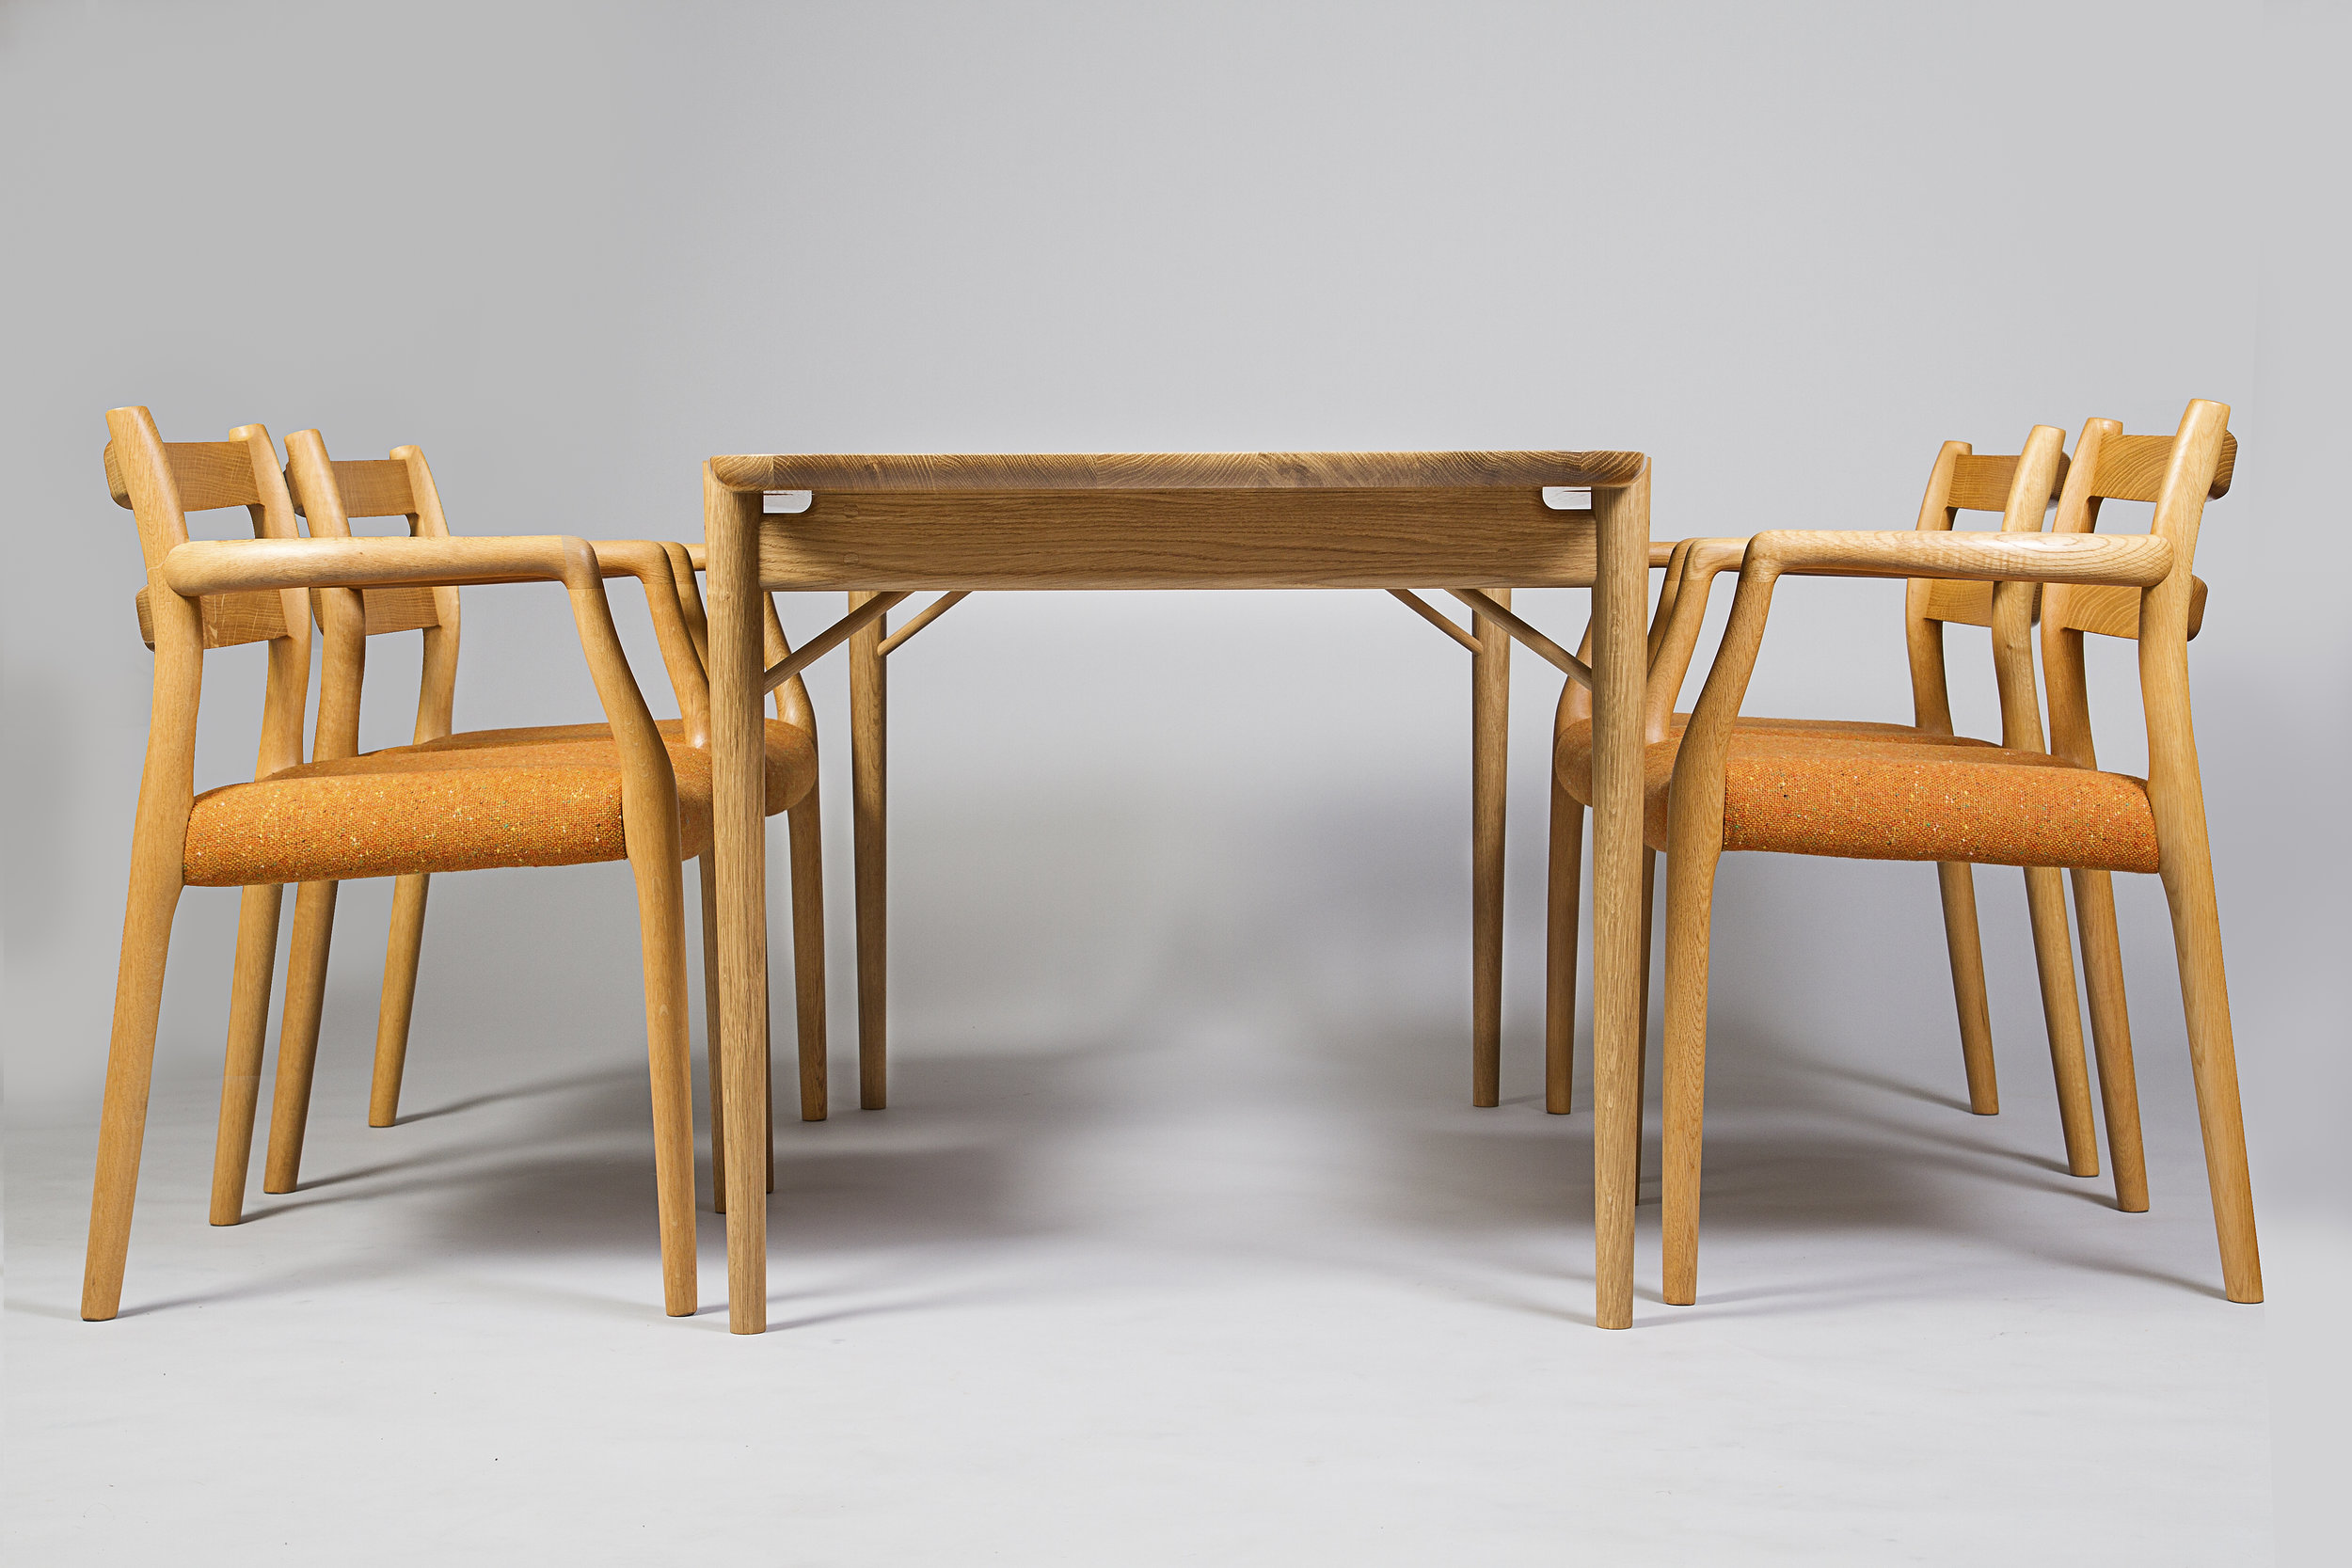 bespoke Danish style handmade dining table